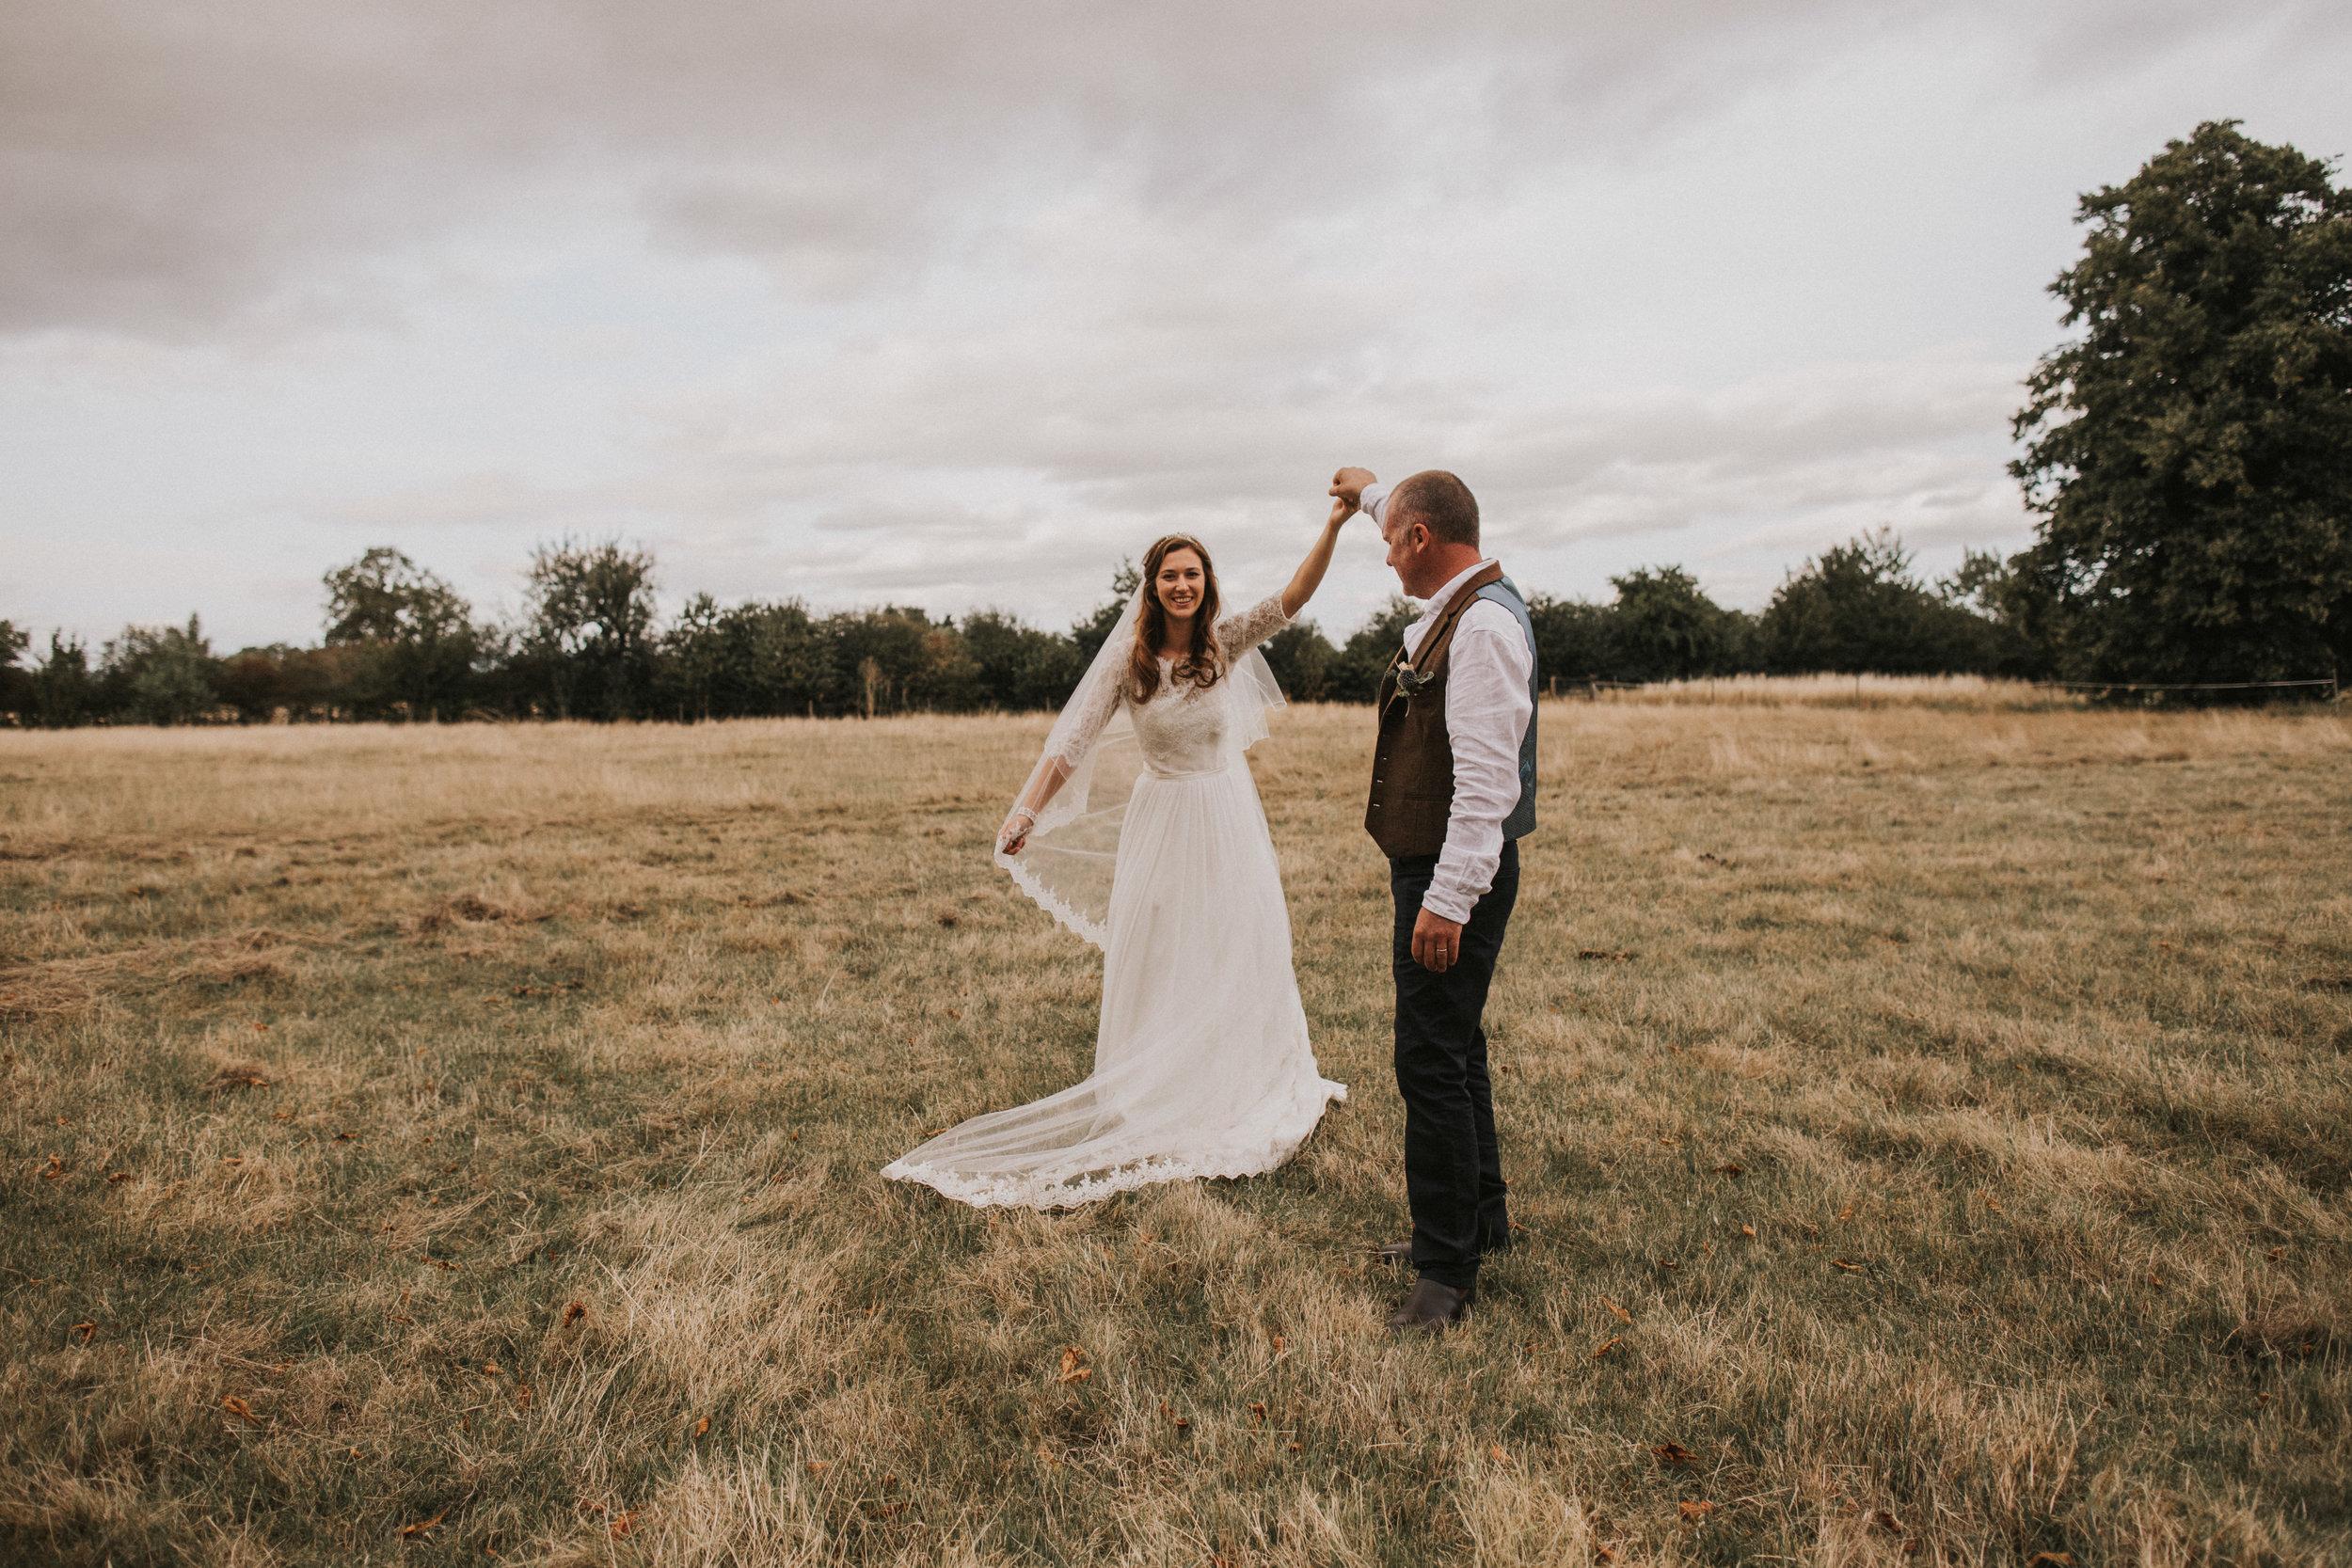 brook rose photography  Farm wedding_93.jpg